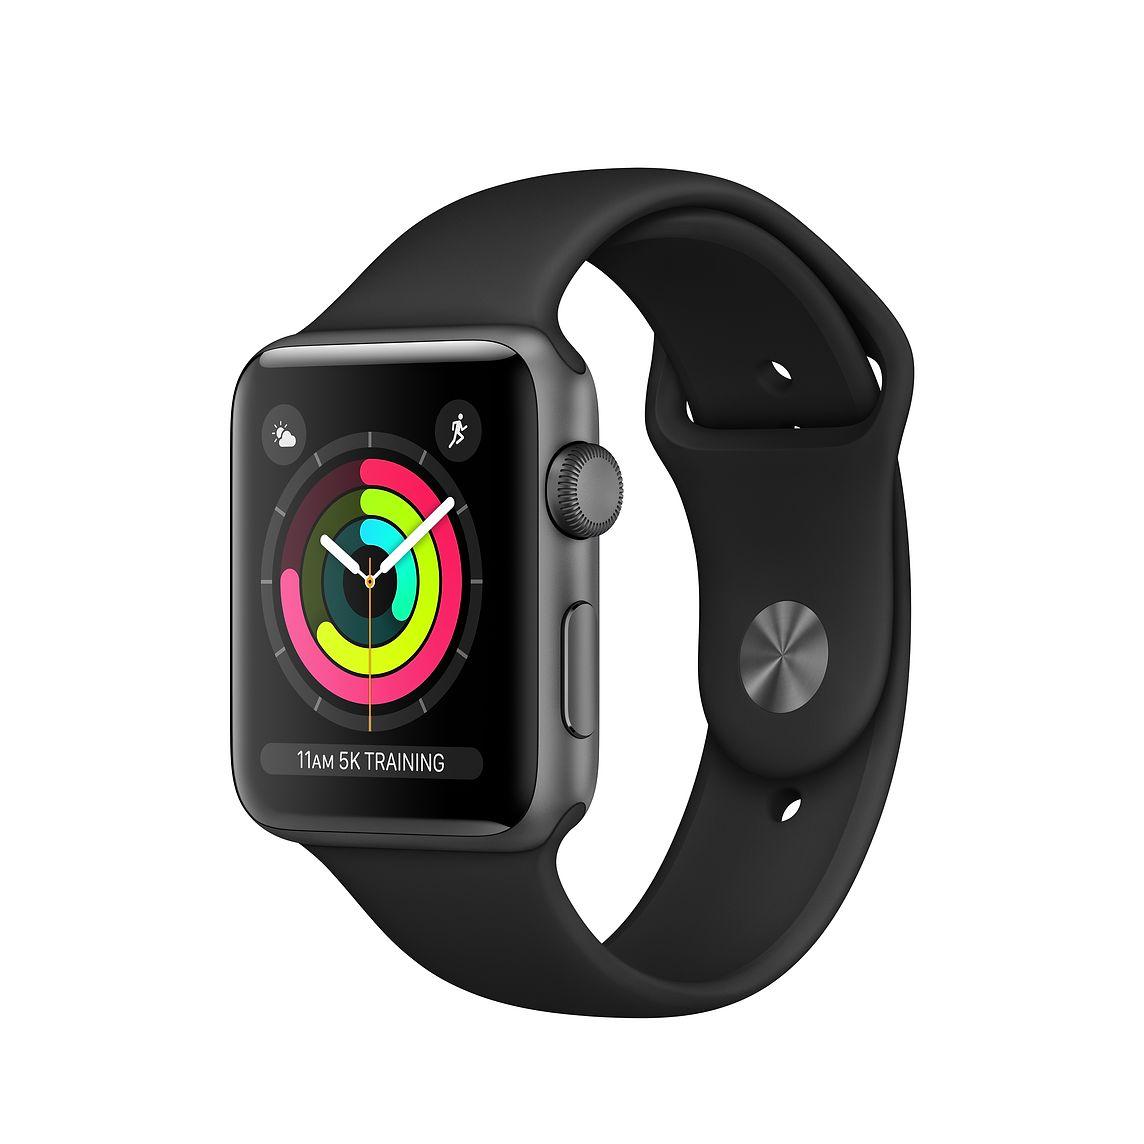 Apple Watch Refurbished S3 GPS 42mm £189 / 38mm £169 @ Apple Store